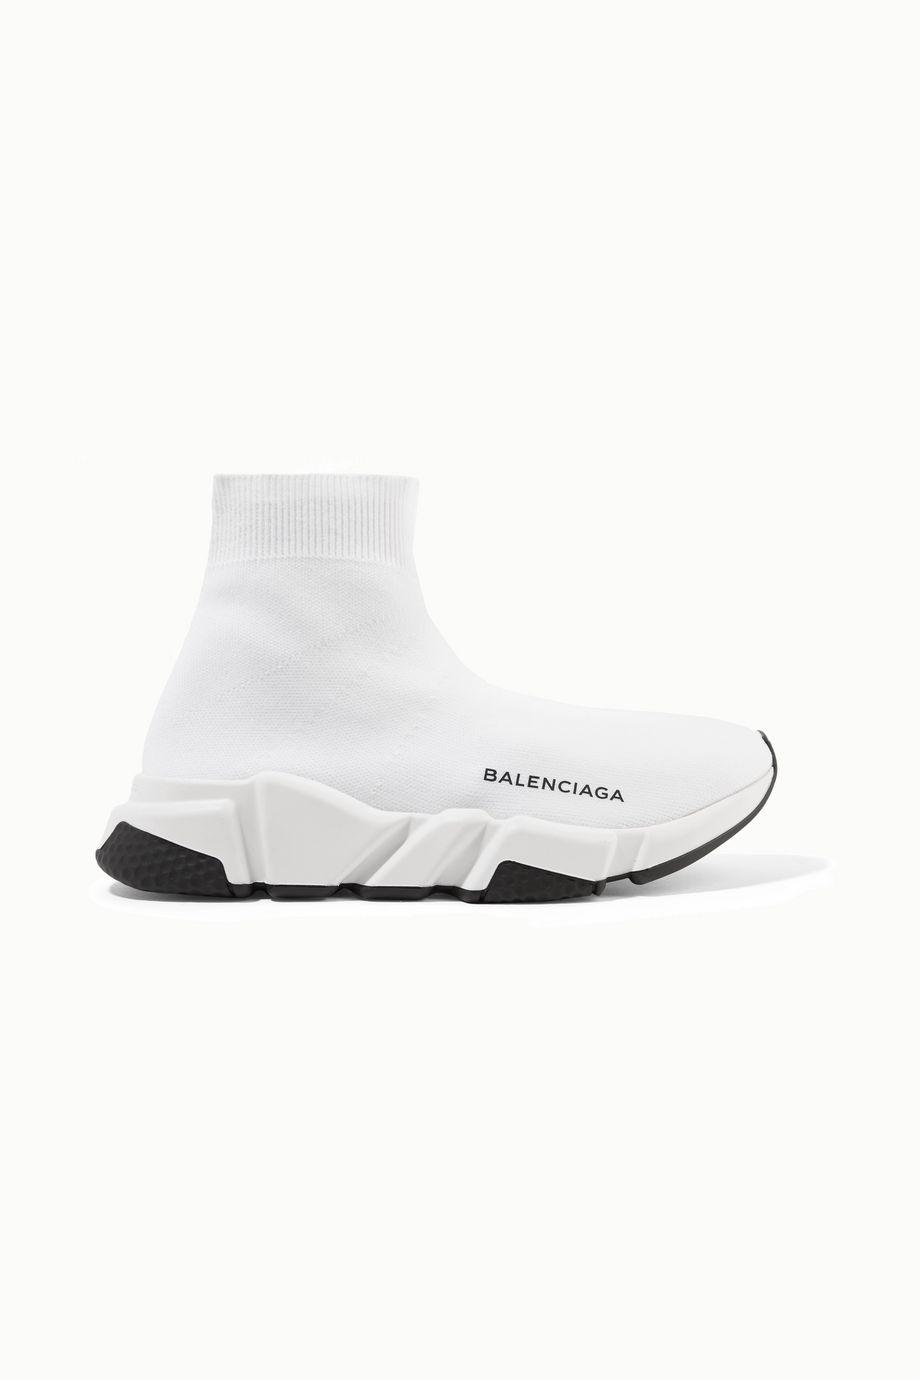 Balenciaga Speed logo-print stretch-knit high-top sneakers